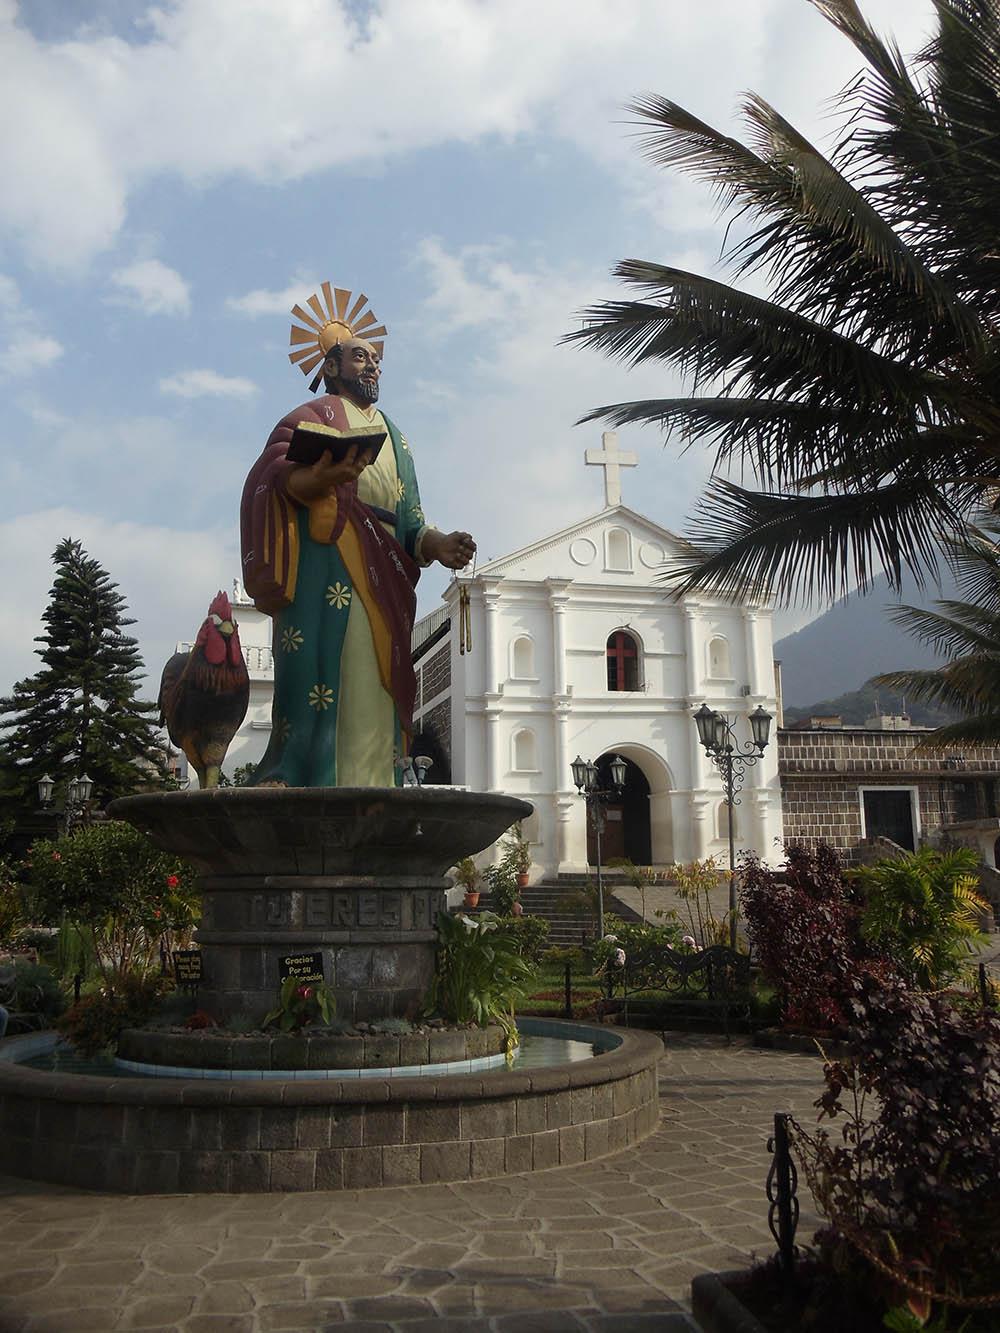 Church of St. Peter is located in San Pedro La Laguna